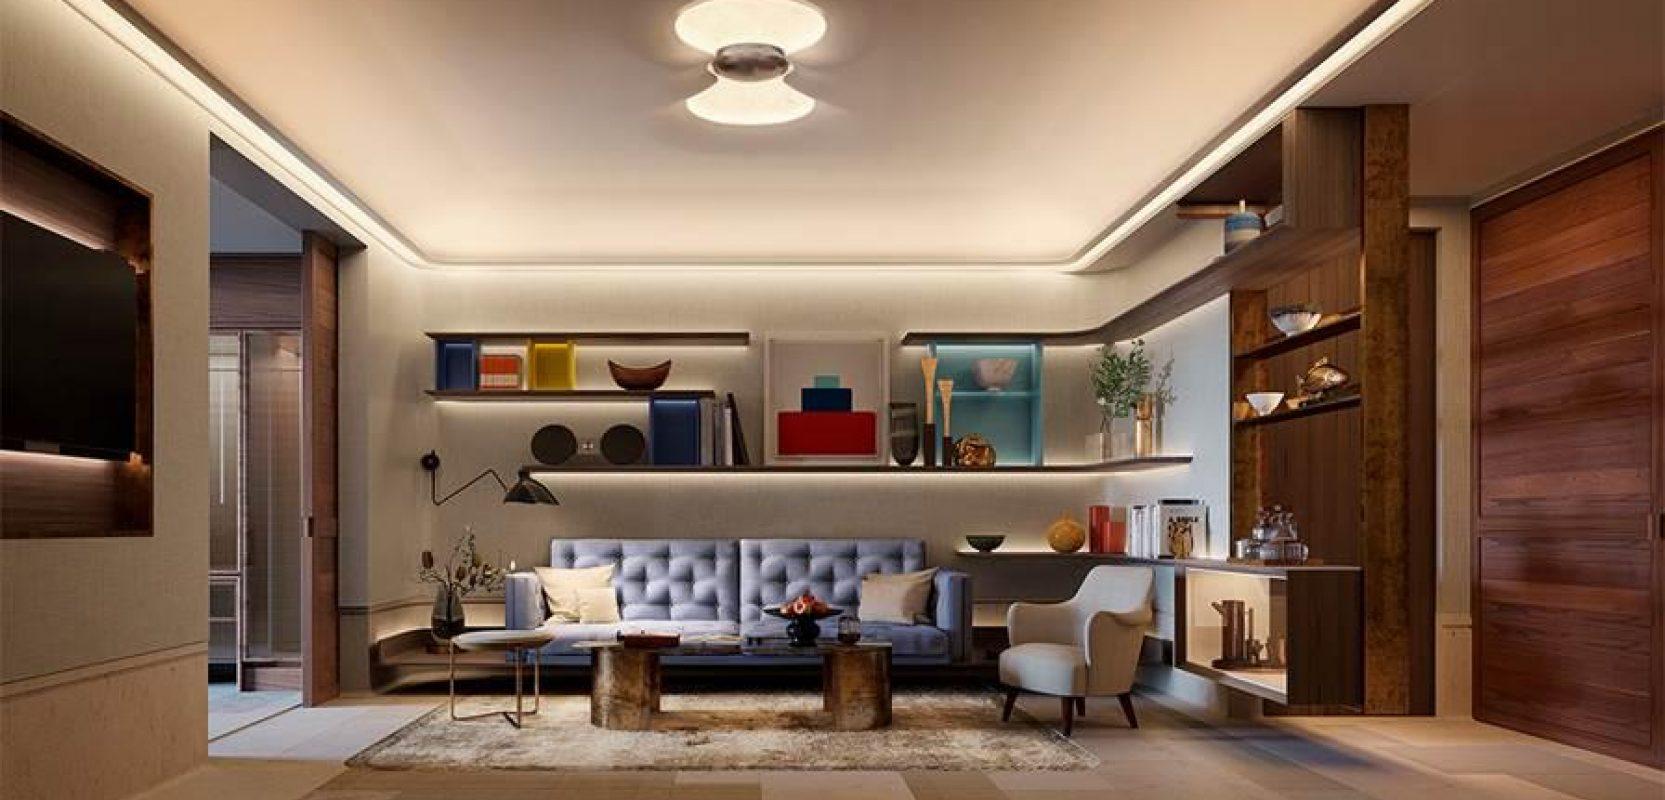 Images of Terrace Suites, Berkeley Hotel project